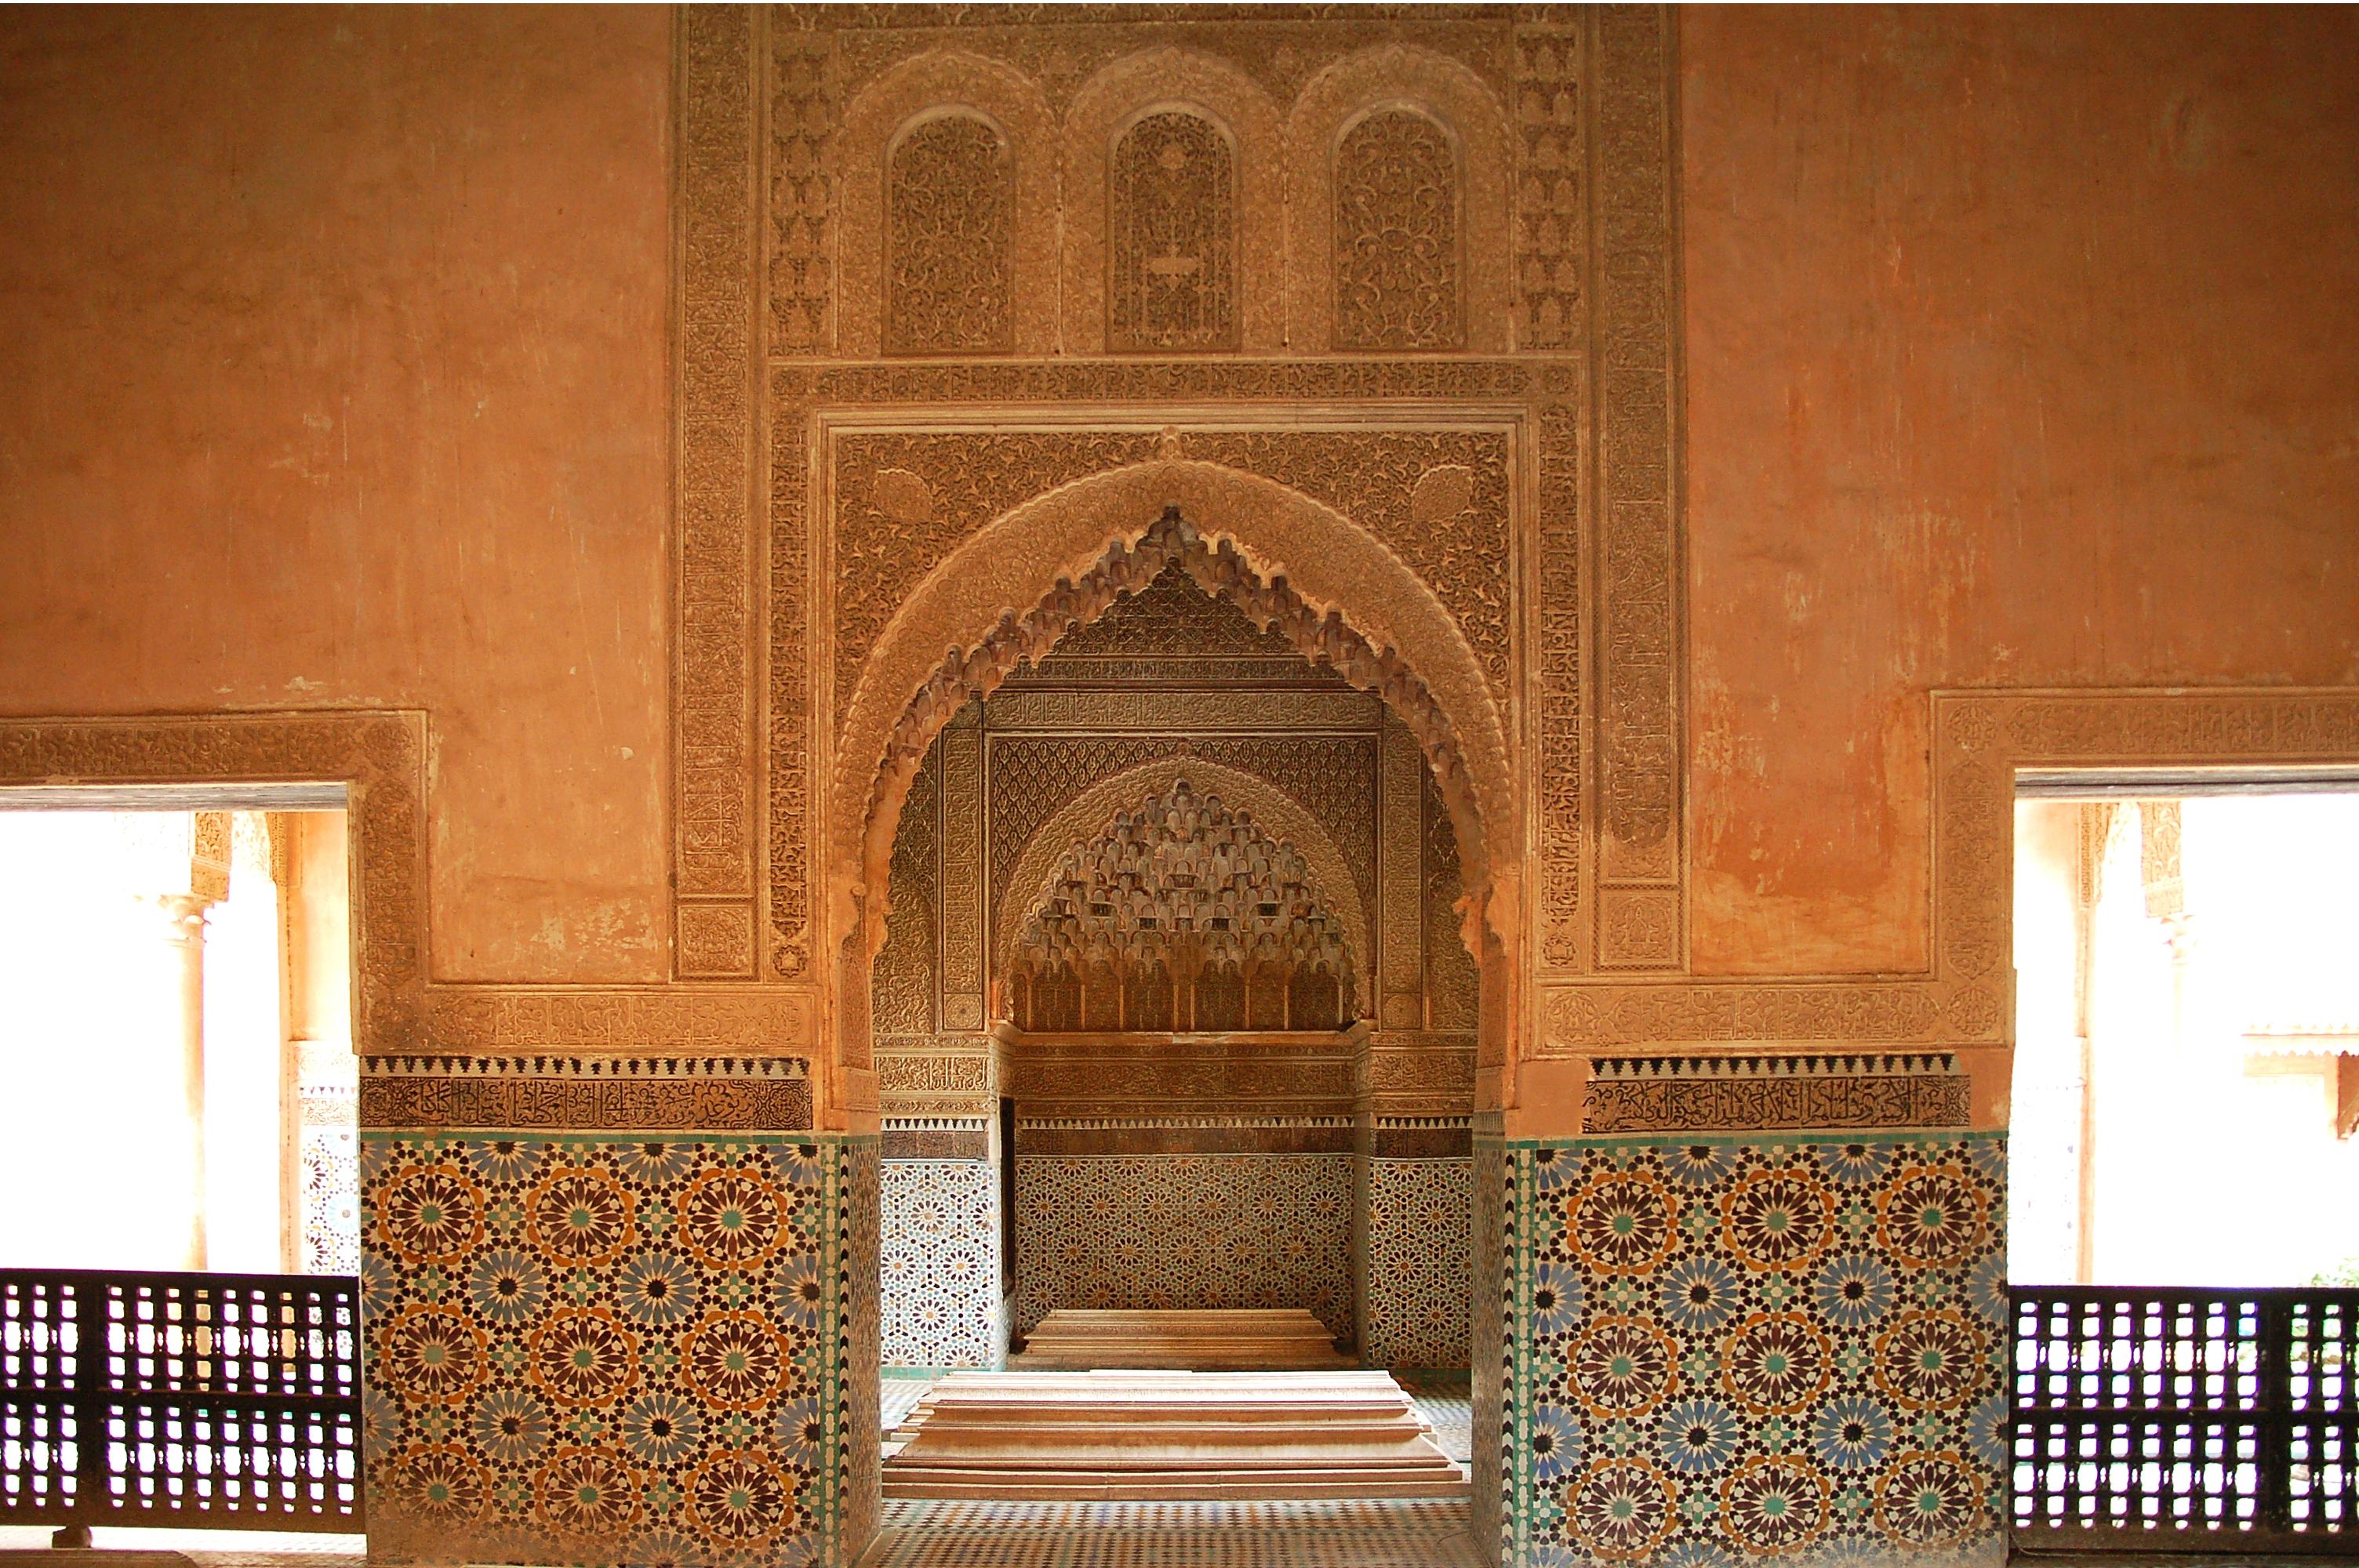 http://upload.wikimedia.org/wikipedia/commons/f/f4/Maroc_Marrakech_Saadiens_Luc_Viatour_2.jpg